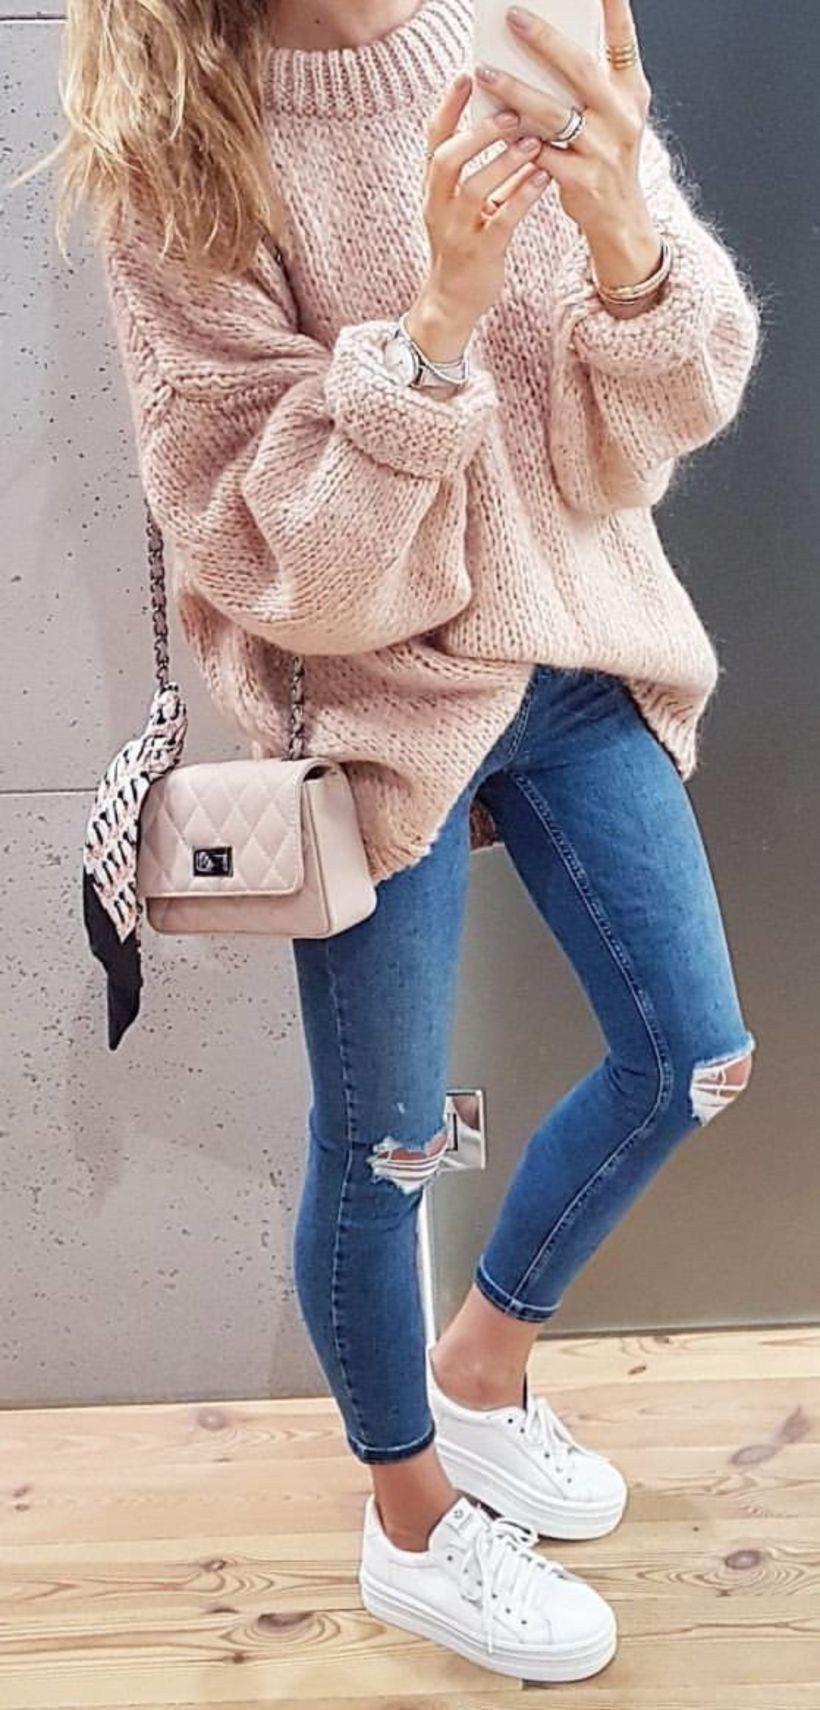 mode femme hiver 30 meilleures id es de tenue hiver femme mode femmes outfit ideen outfit. Black Bedroom Furniture Sets. Home Design Ideas